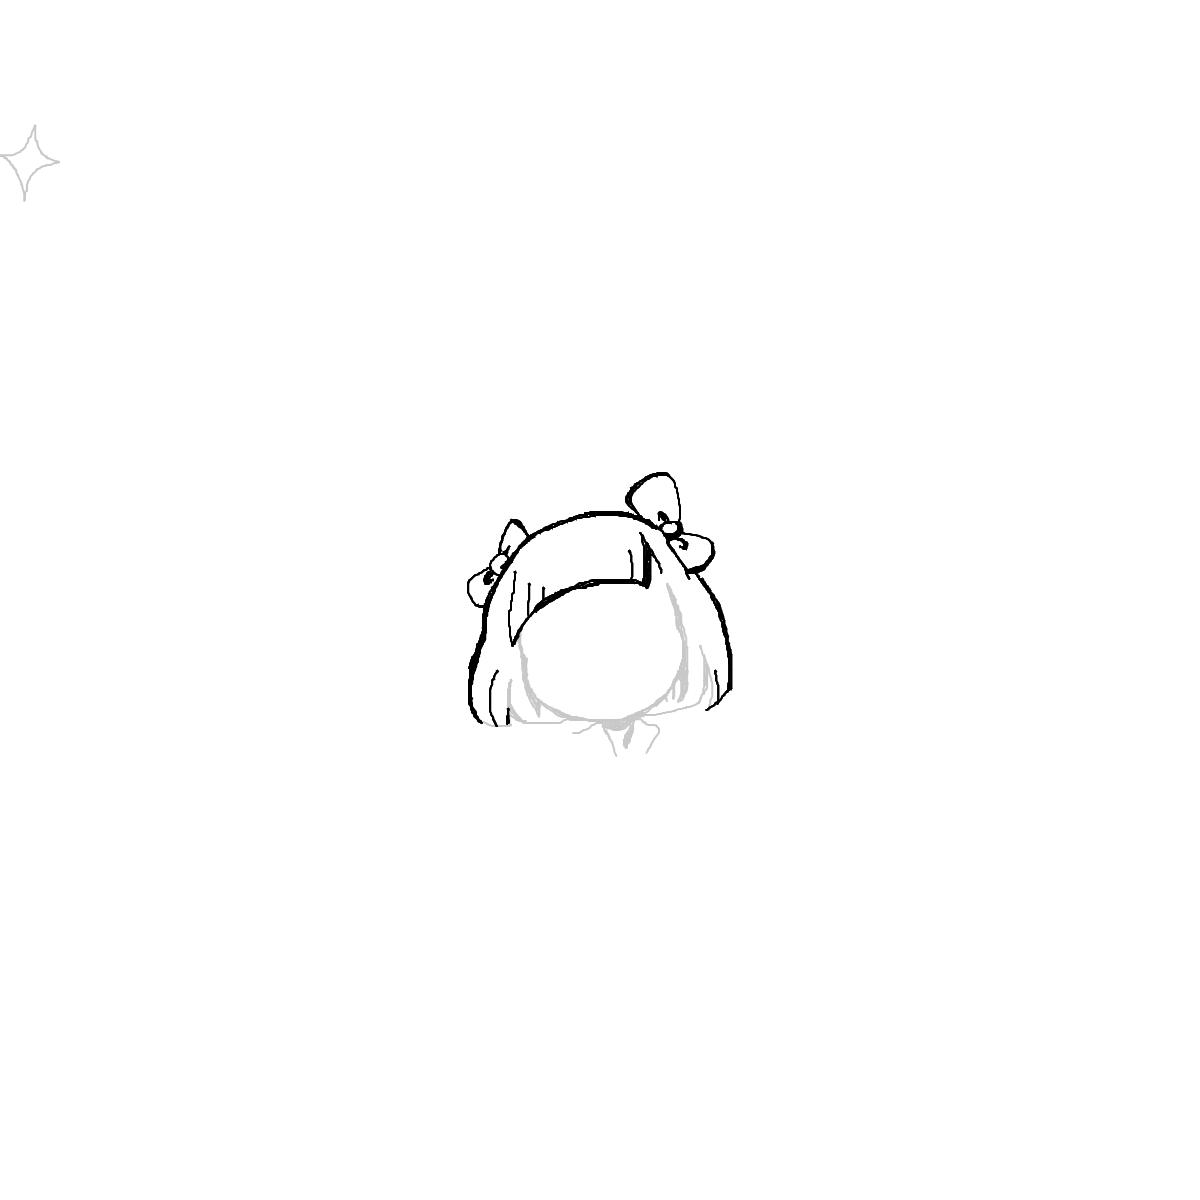 BAAAM drawing#23652 lat:41.0459442138671900lng: -79.6111145019531200